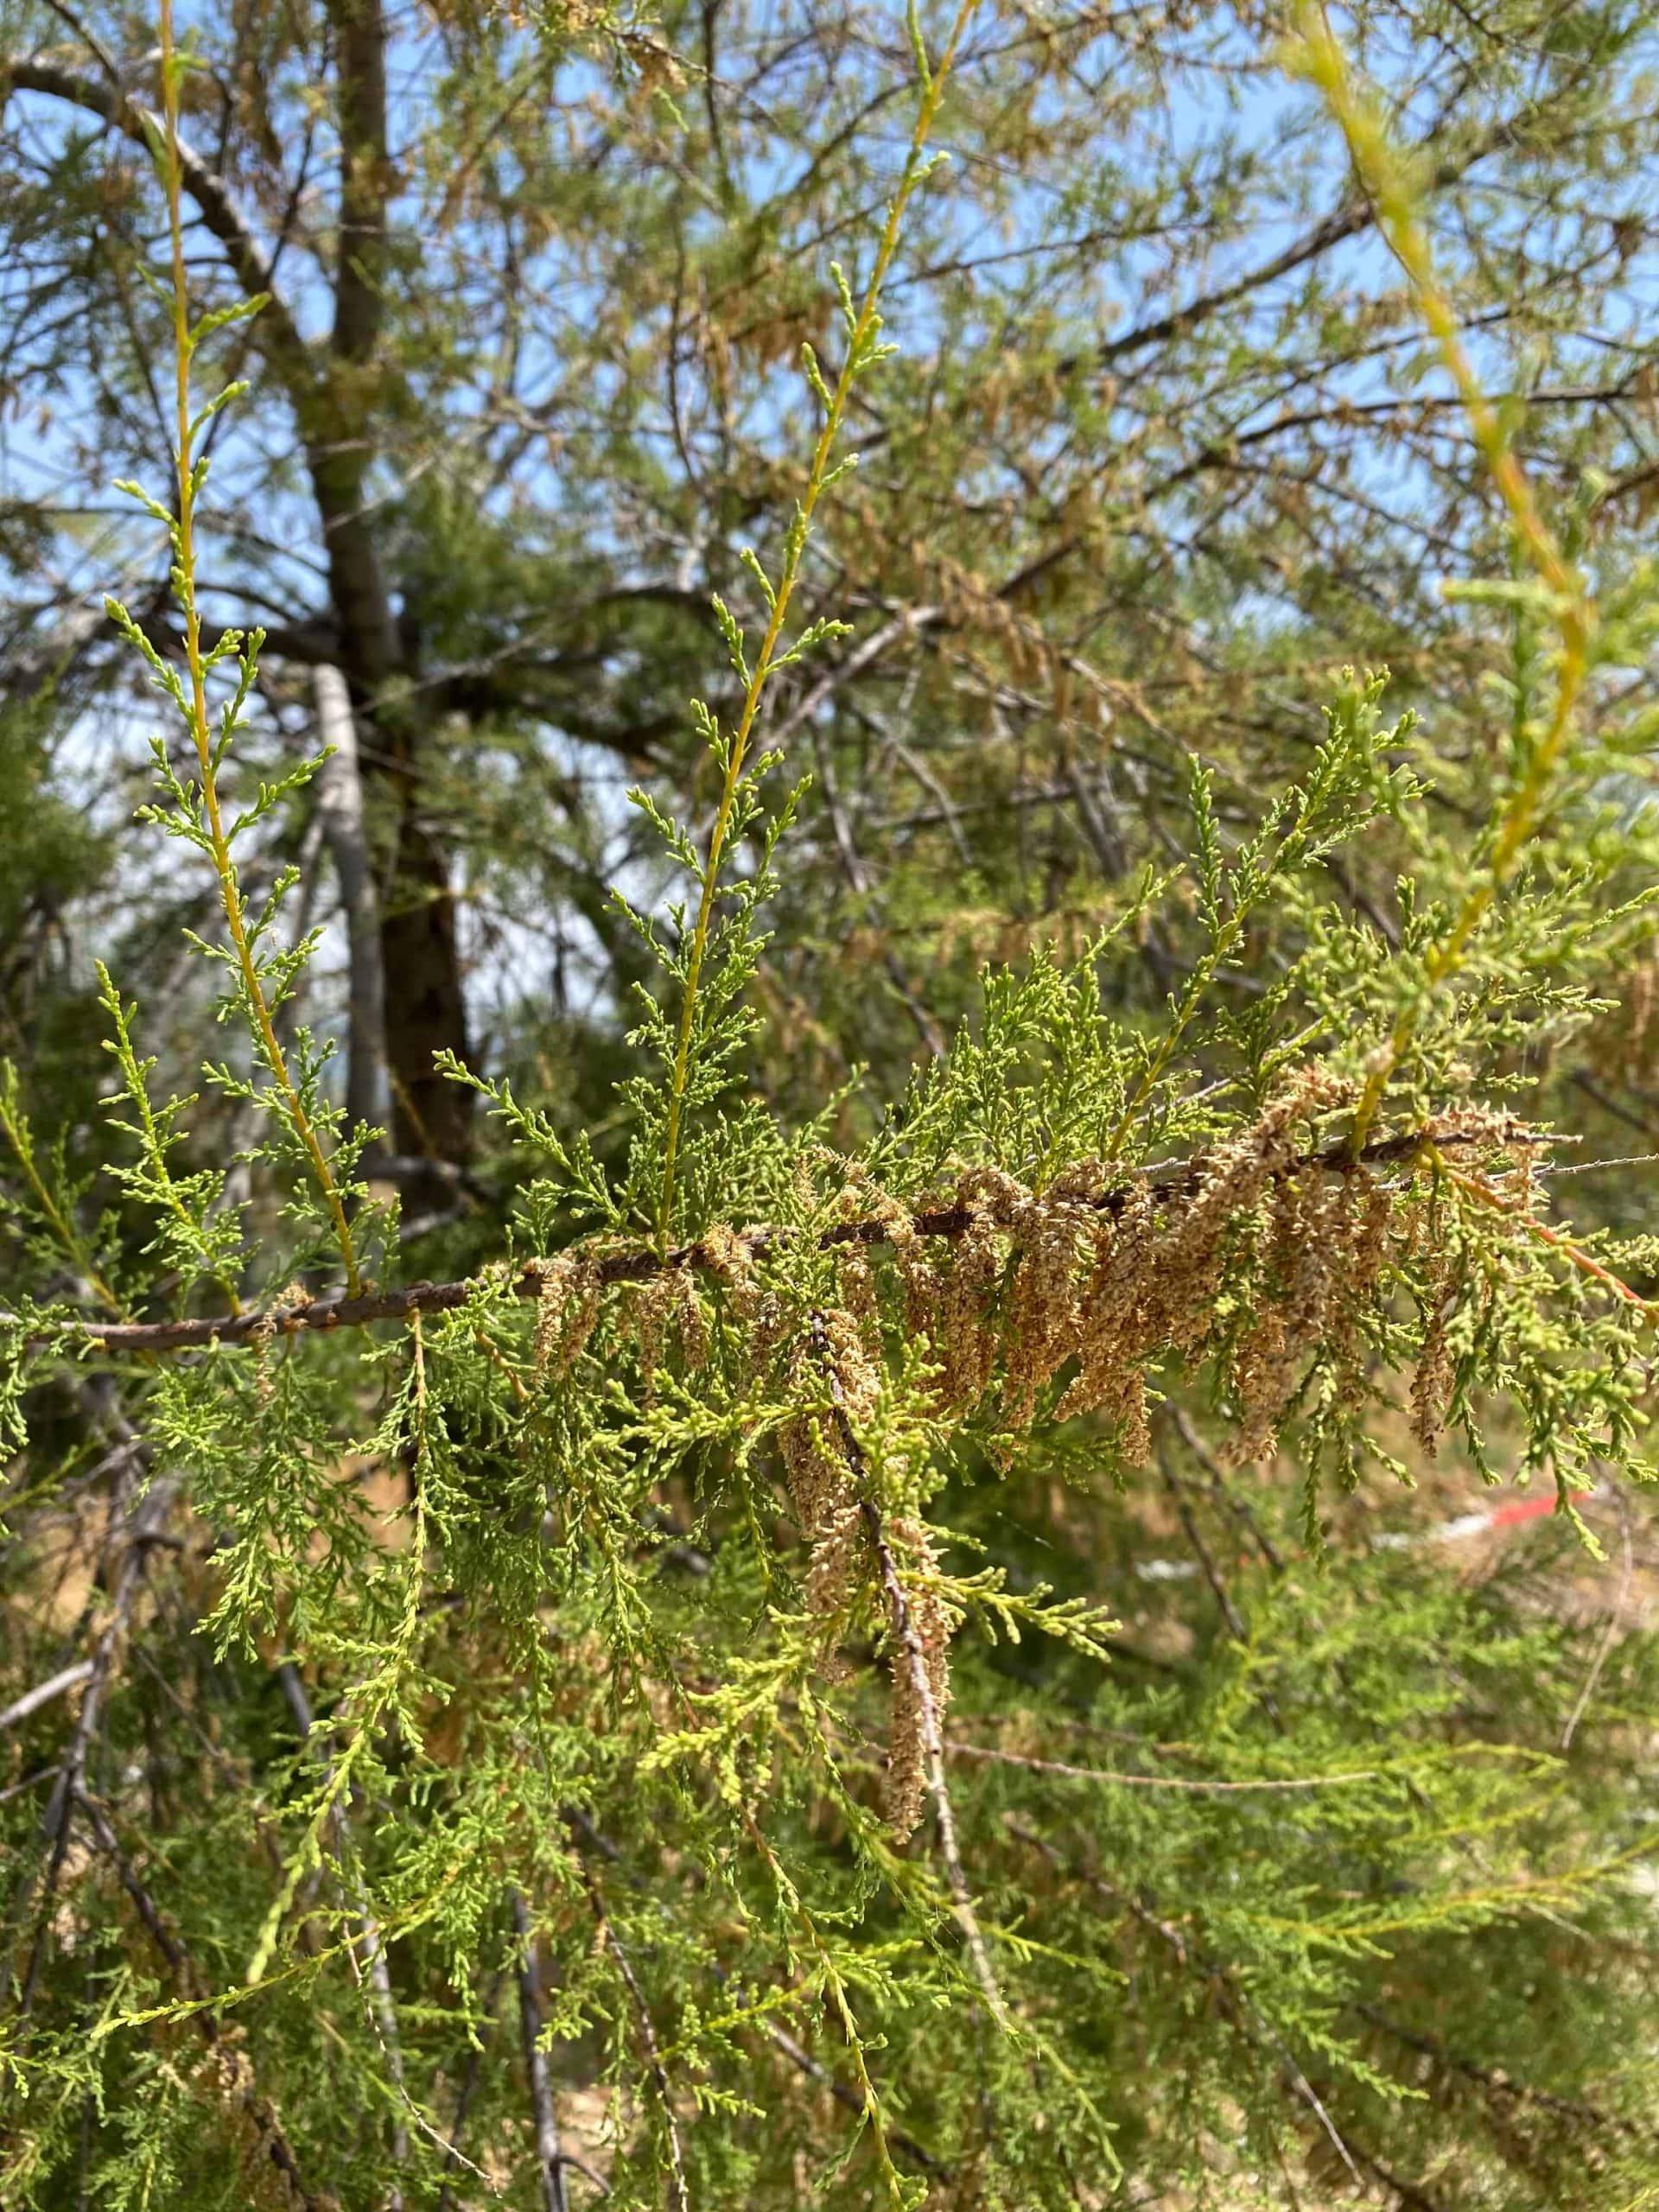 Taray. Tamarix gallica